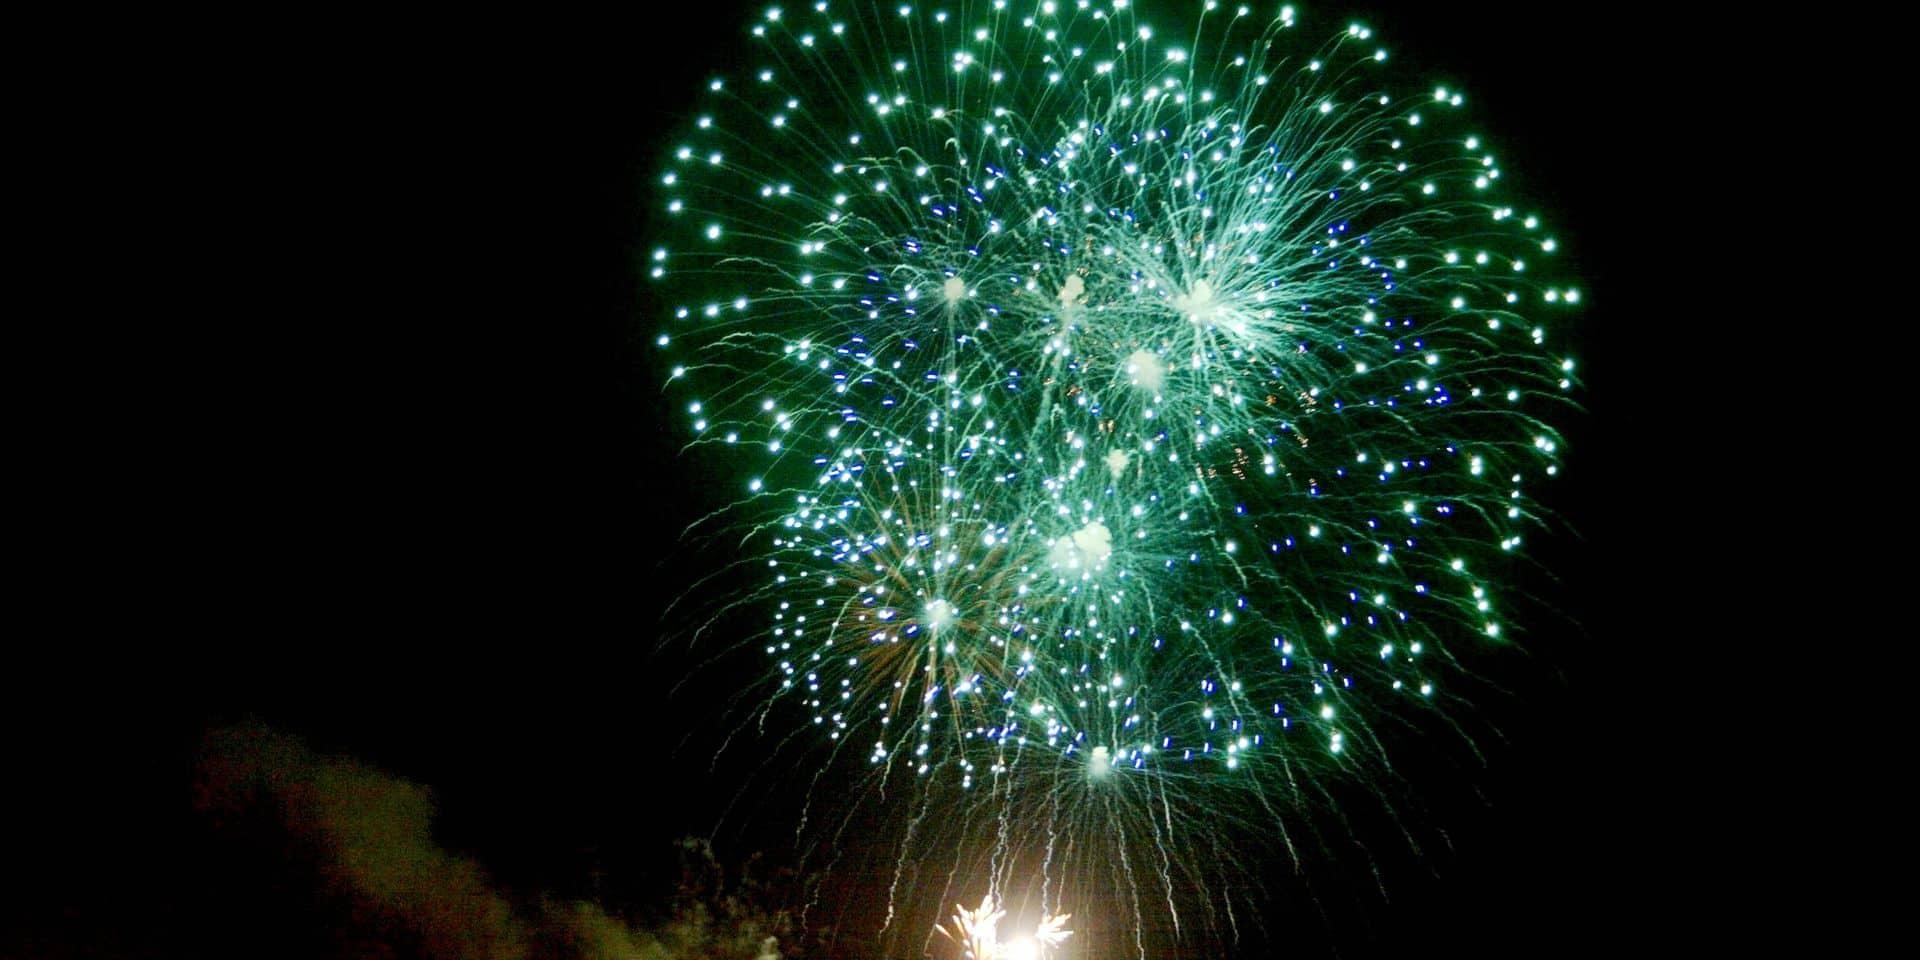 Comines : Le feu d'artifice du 21 juillet sera moins bruyant